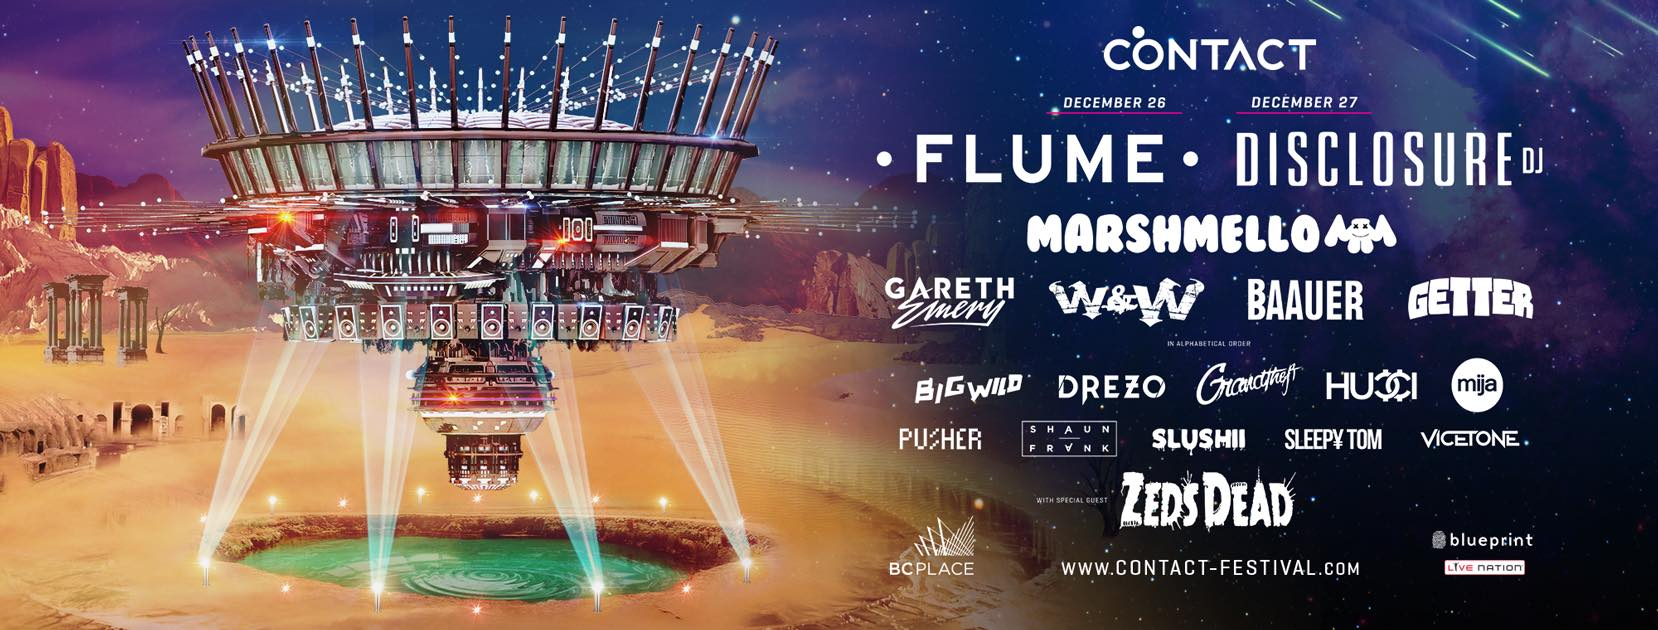 Contact-Music-Festival.jpg